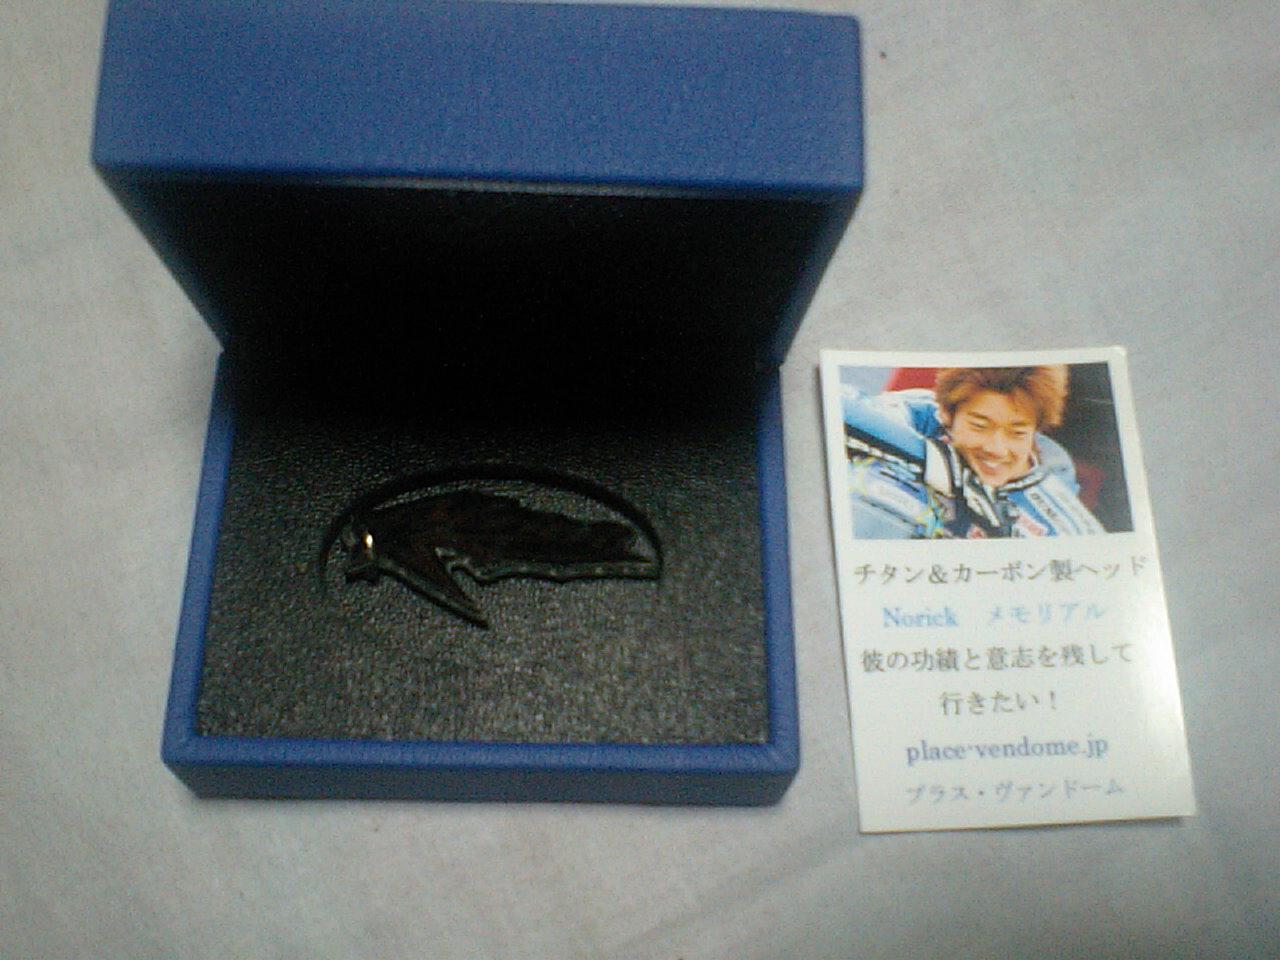 http://img.blogs.yahoo.co.jp/ybi/1/13/f5/tetsutaro499/folder/420377/img_420377_43031702_0?1215421760